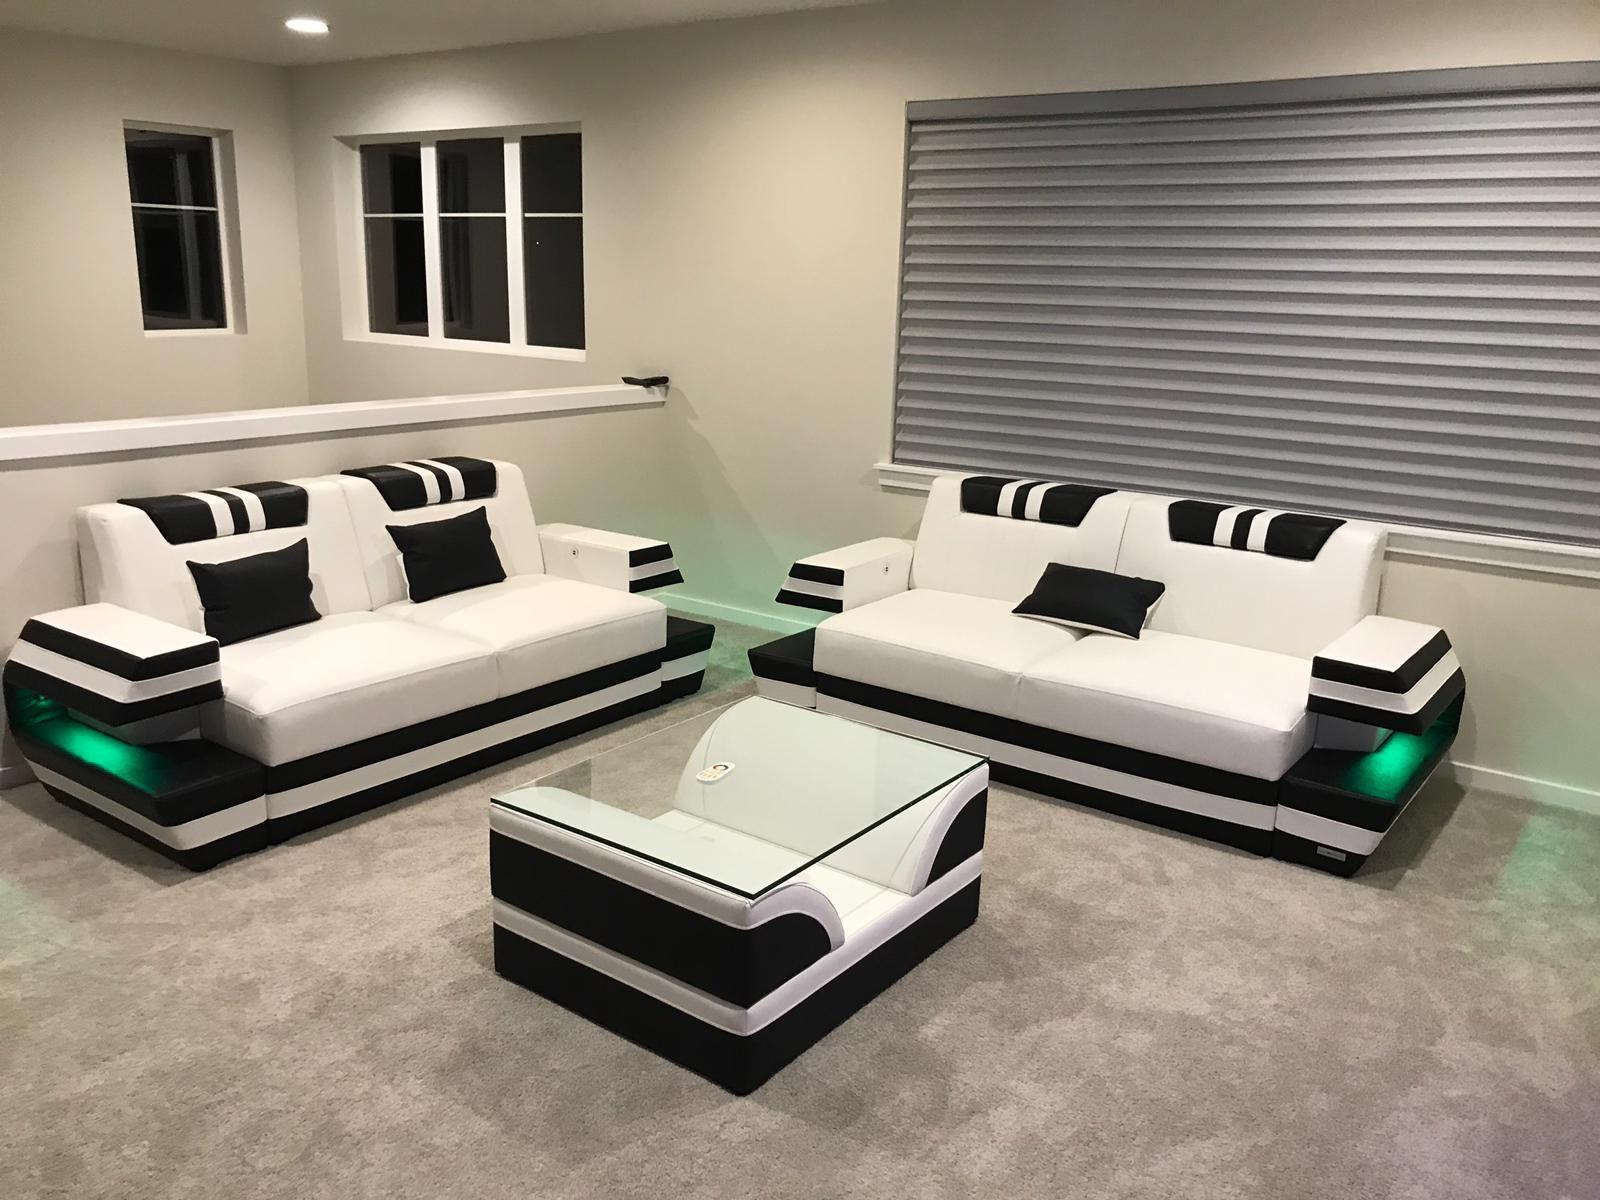 Sectional Leather Sofa Houston L Shape Living Room Sofa Design Leather Sectional Sofas Leather Sofa